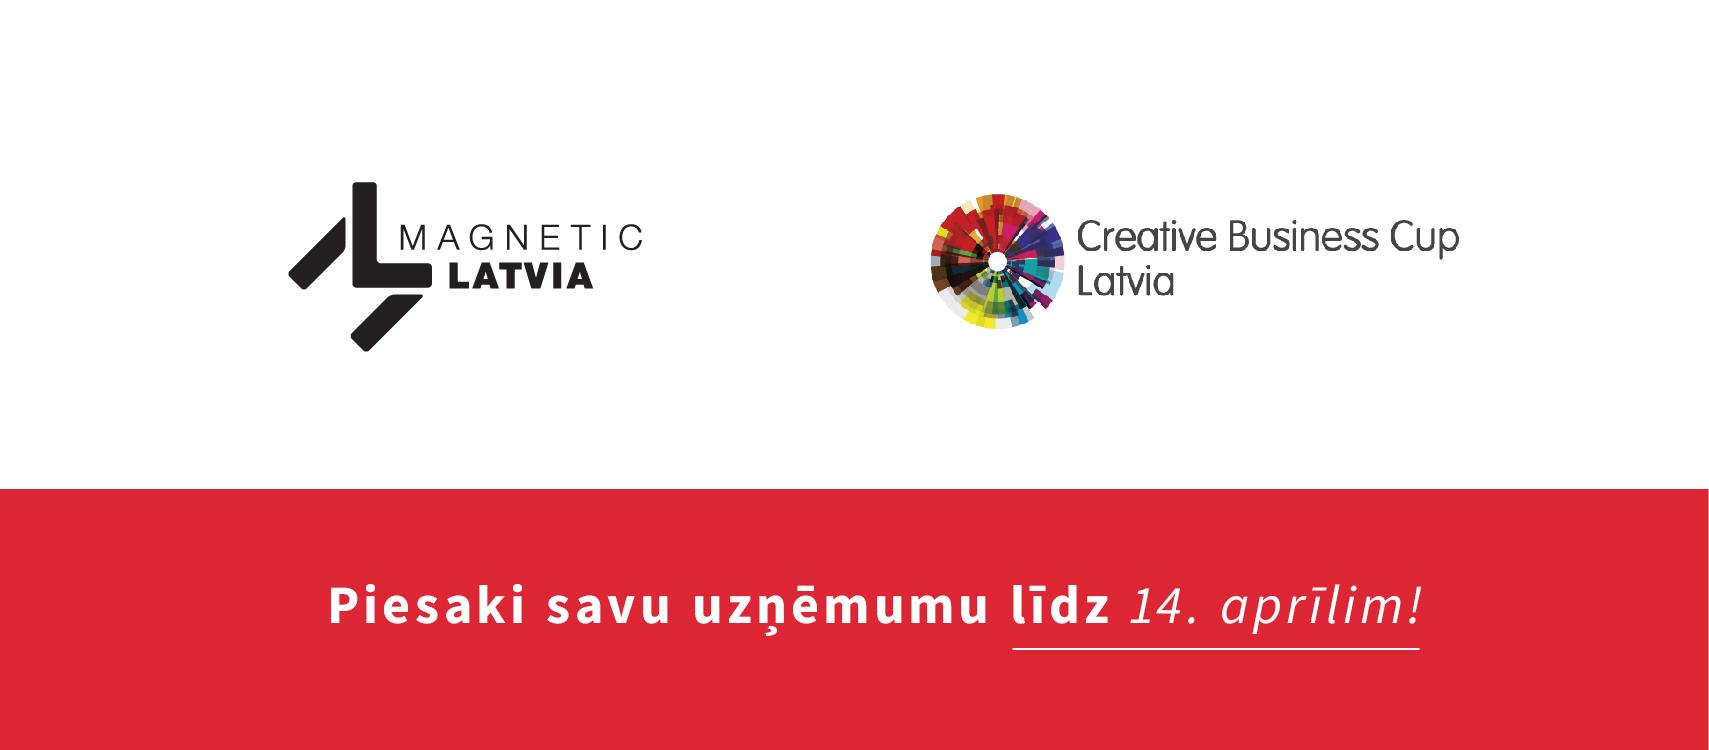 Piesaki savu biznesa ideju konkursa Creative Business Cup (CBC) 2019 nacionālajai atlasei